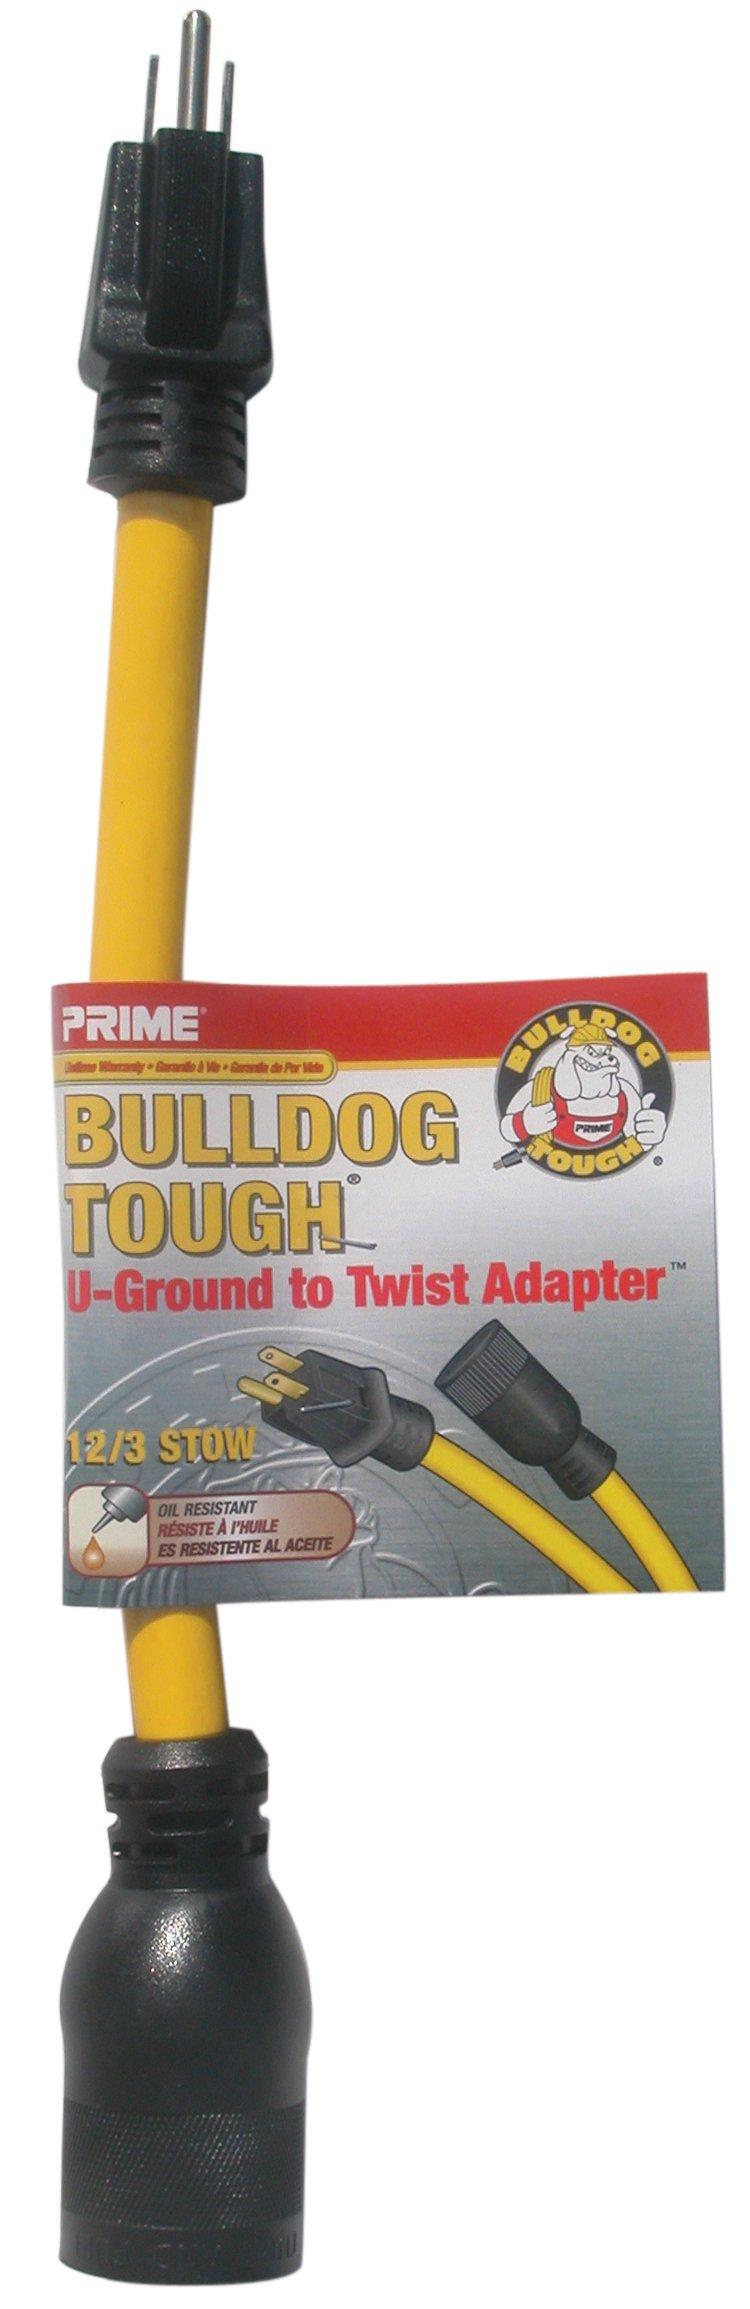 PrimeAD110801L 1-Feet 12/3 STOW U-Ground to Twist Adapter, Yellow